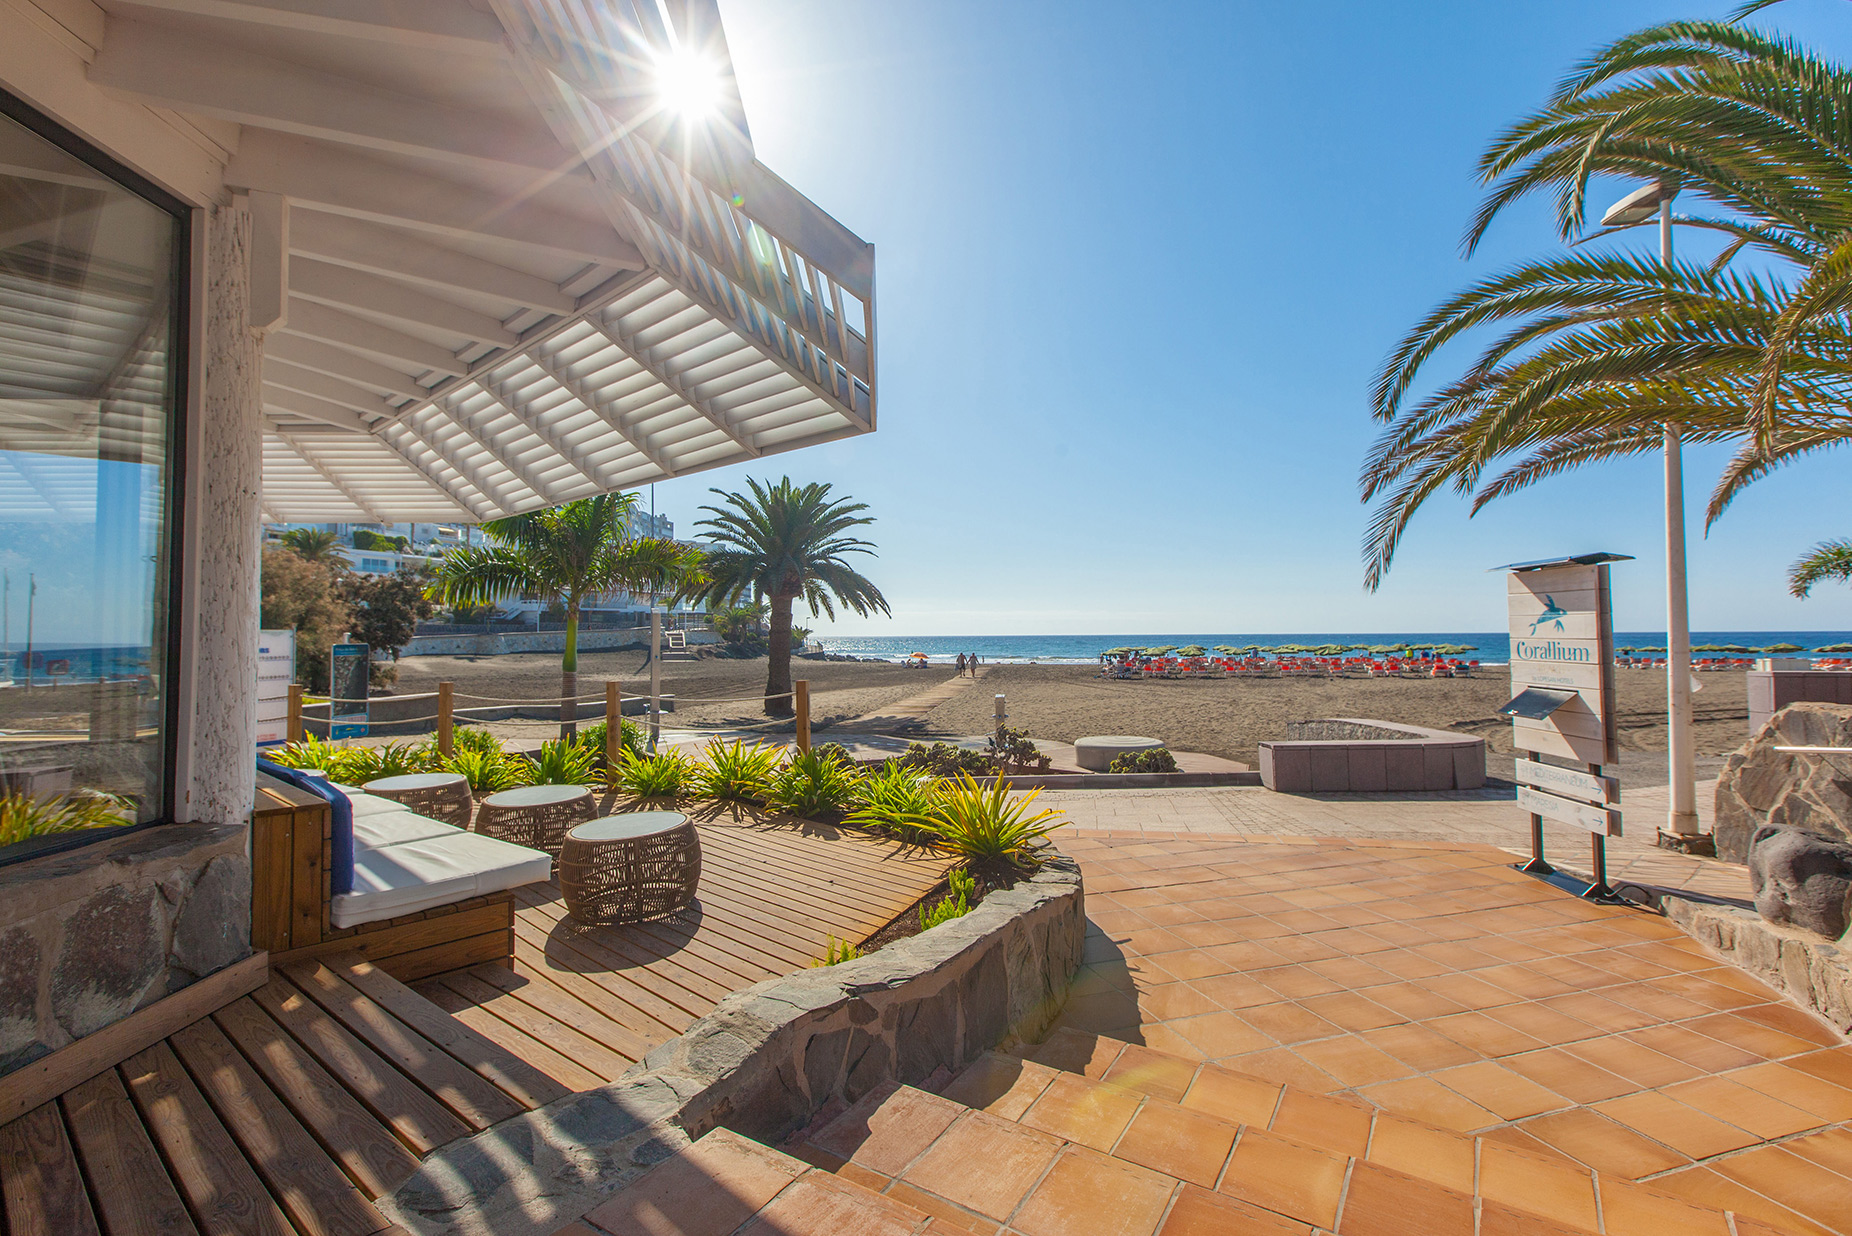 Corallium Beach by Lopesan Hotels (Gran Canaria)